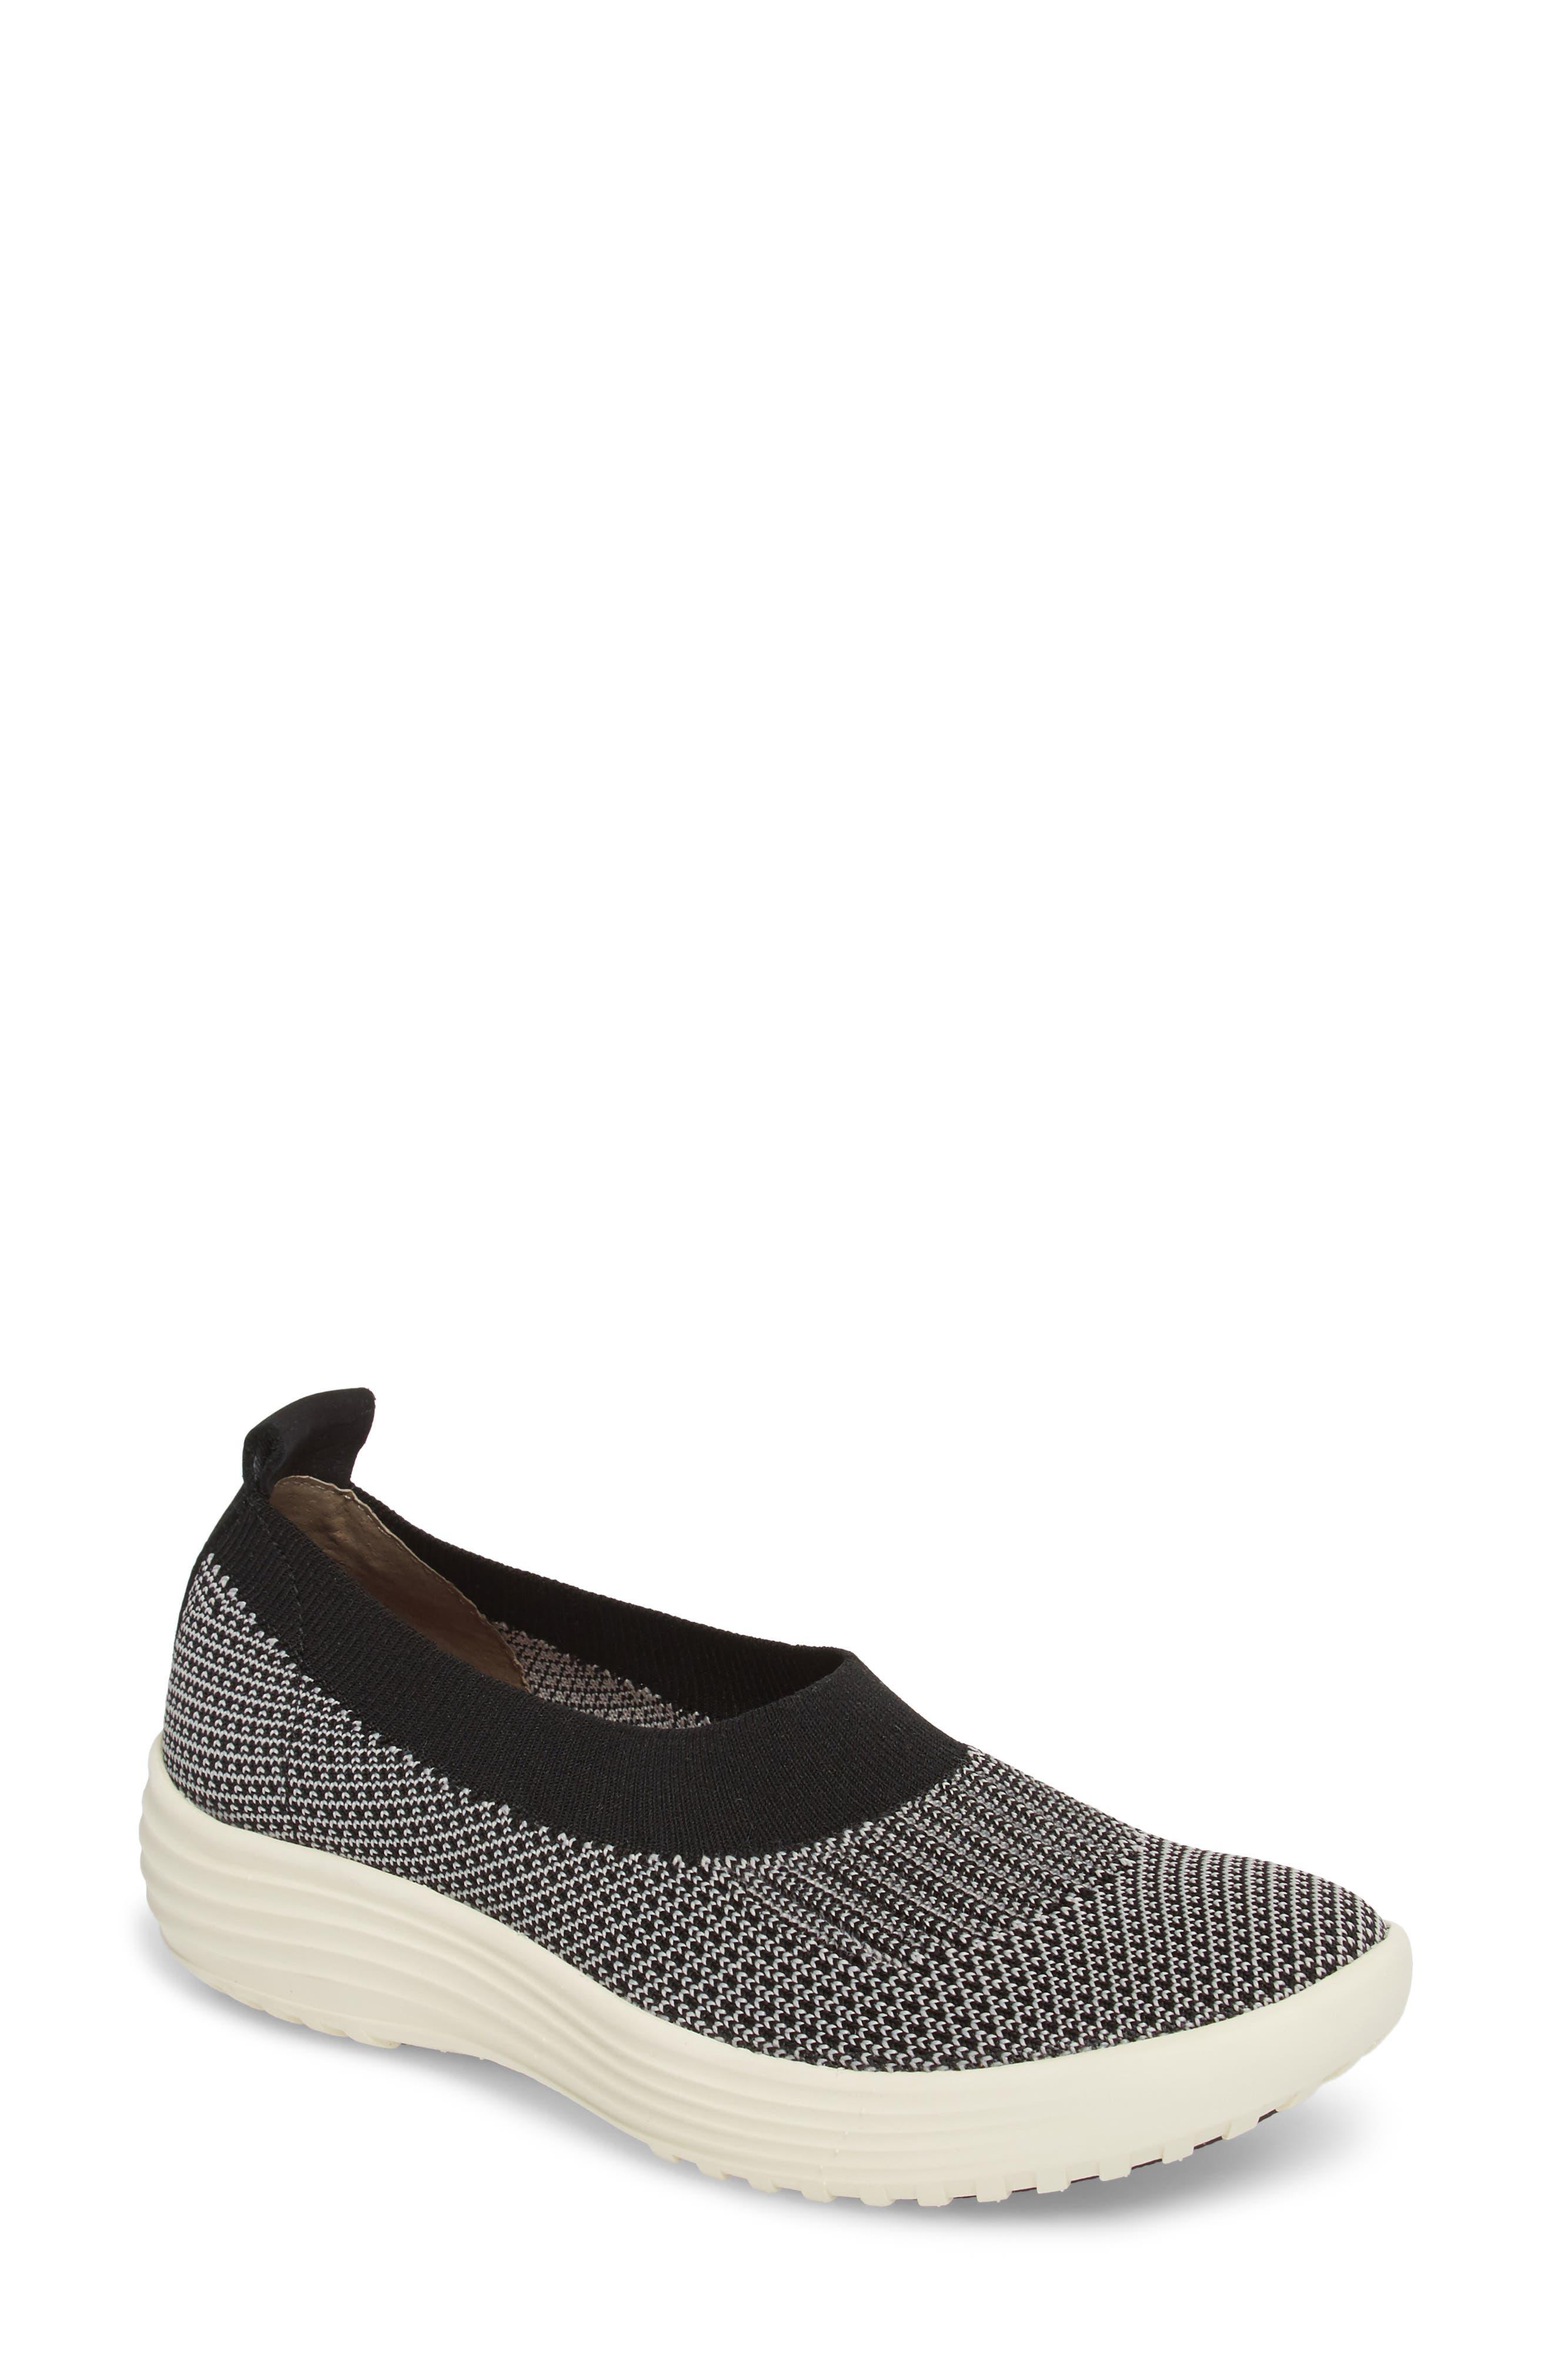 Merigold Slip-On Sock Fit Sneaker,                             Main thumbnail 1, color,                             BLACK/ MIST GREY FABRIC